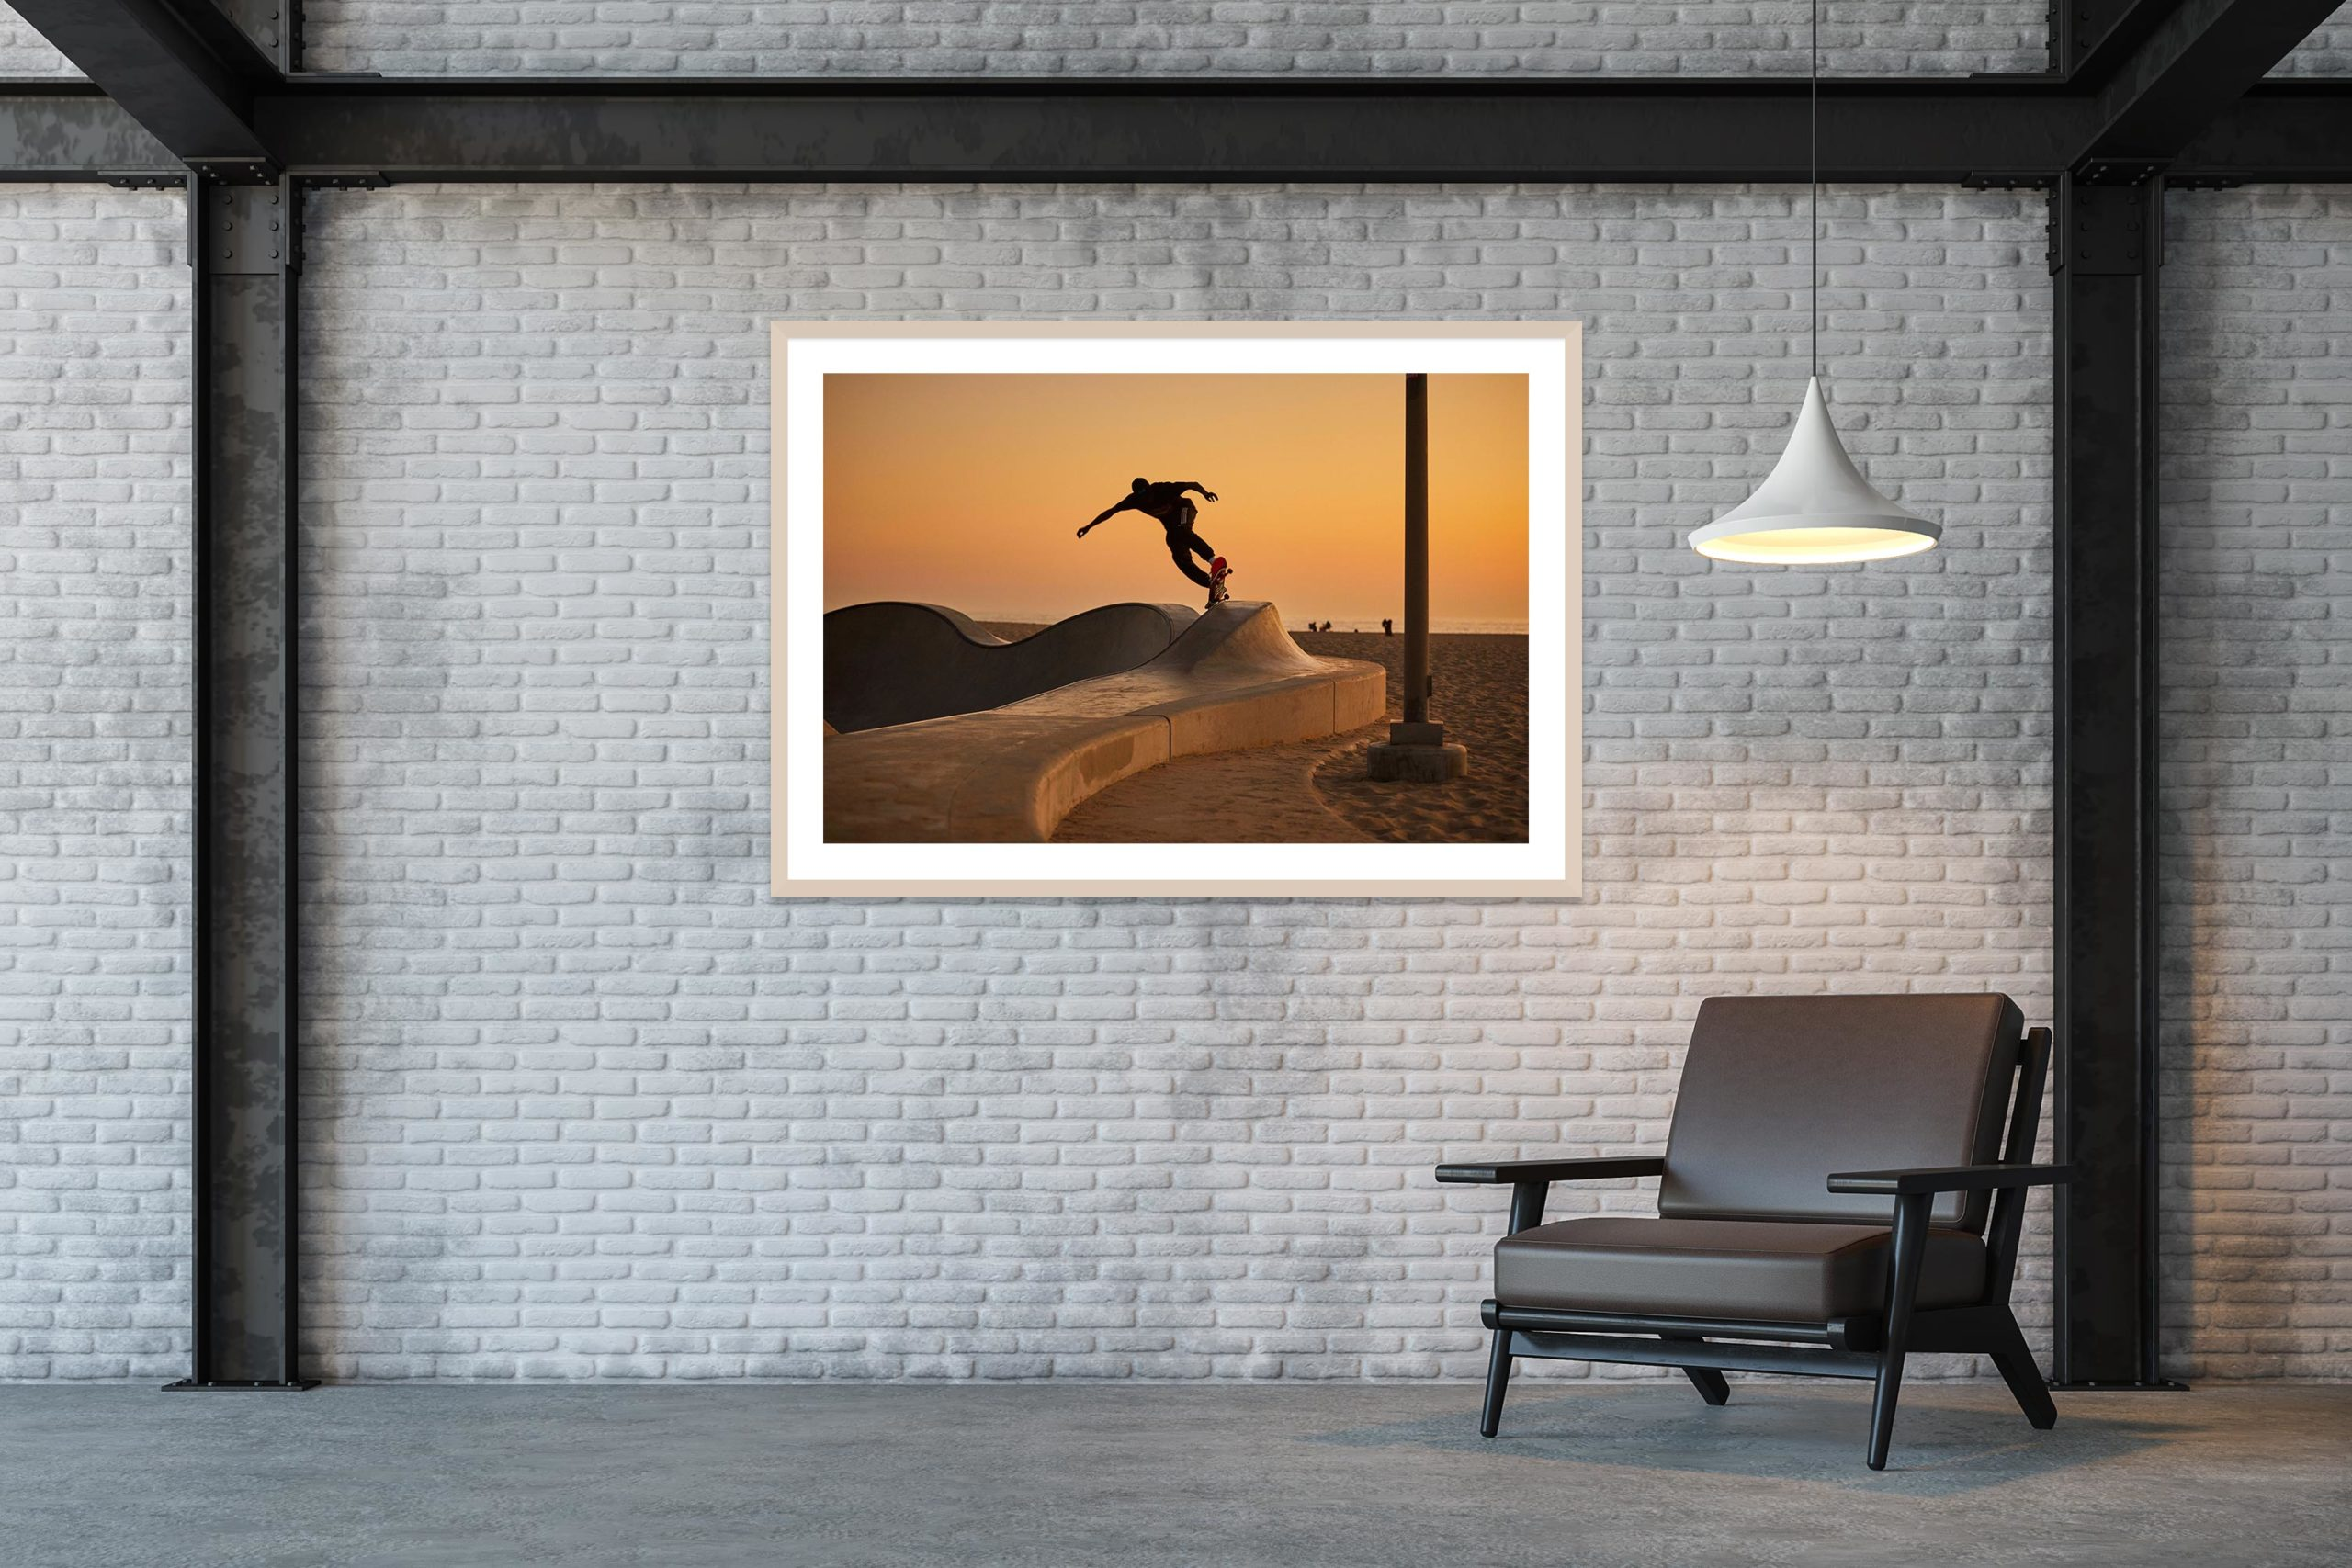 Under Last Light - Timber Frame - Skate Park, Venice Beach Collection - Fine Art Photography by Toby Dixon